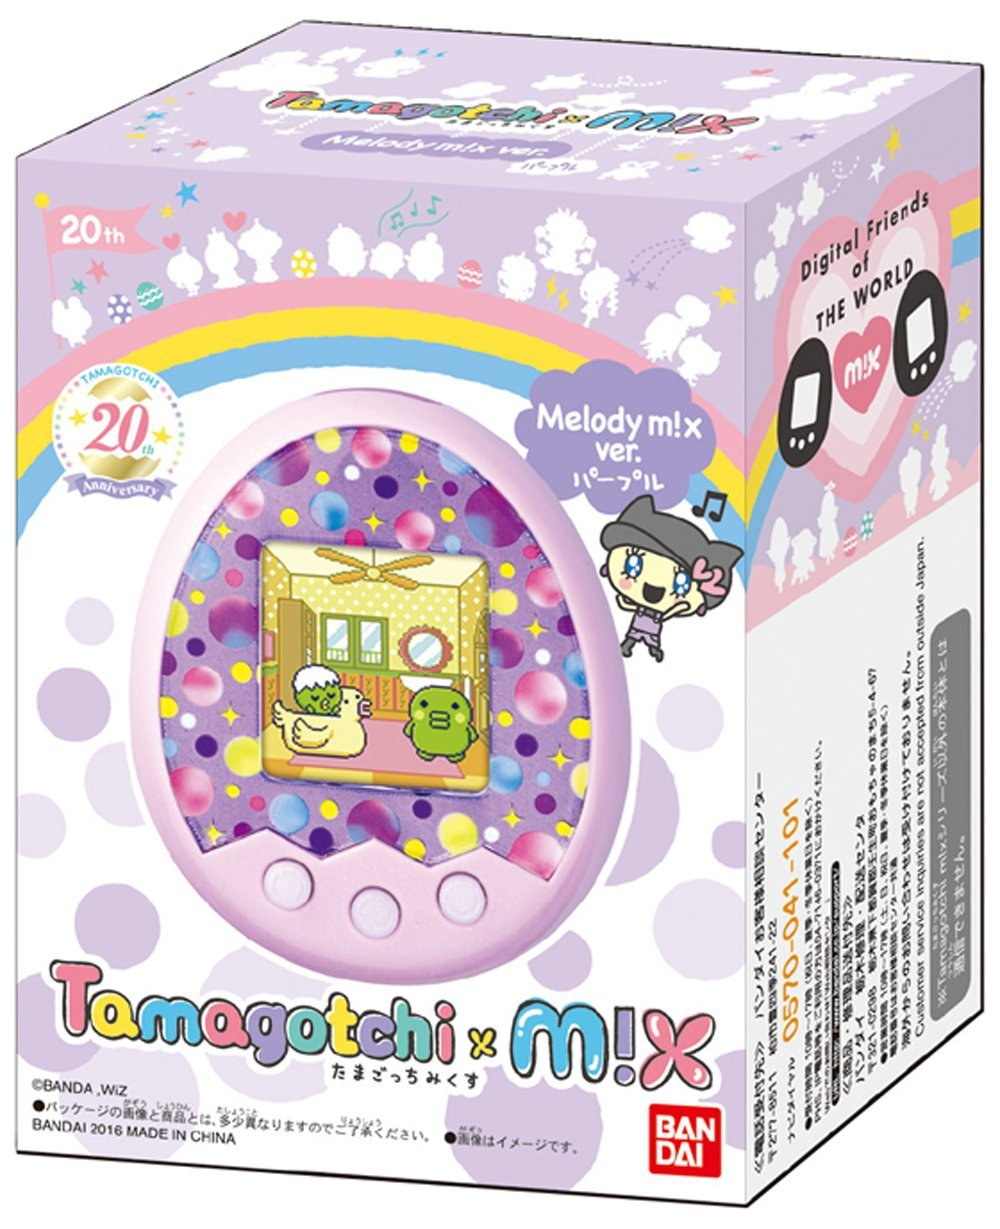 Tamagotchi m!x Melody m!x ver by Tamagotchi (Image #2)